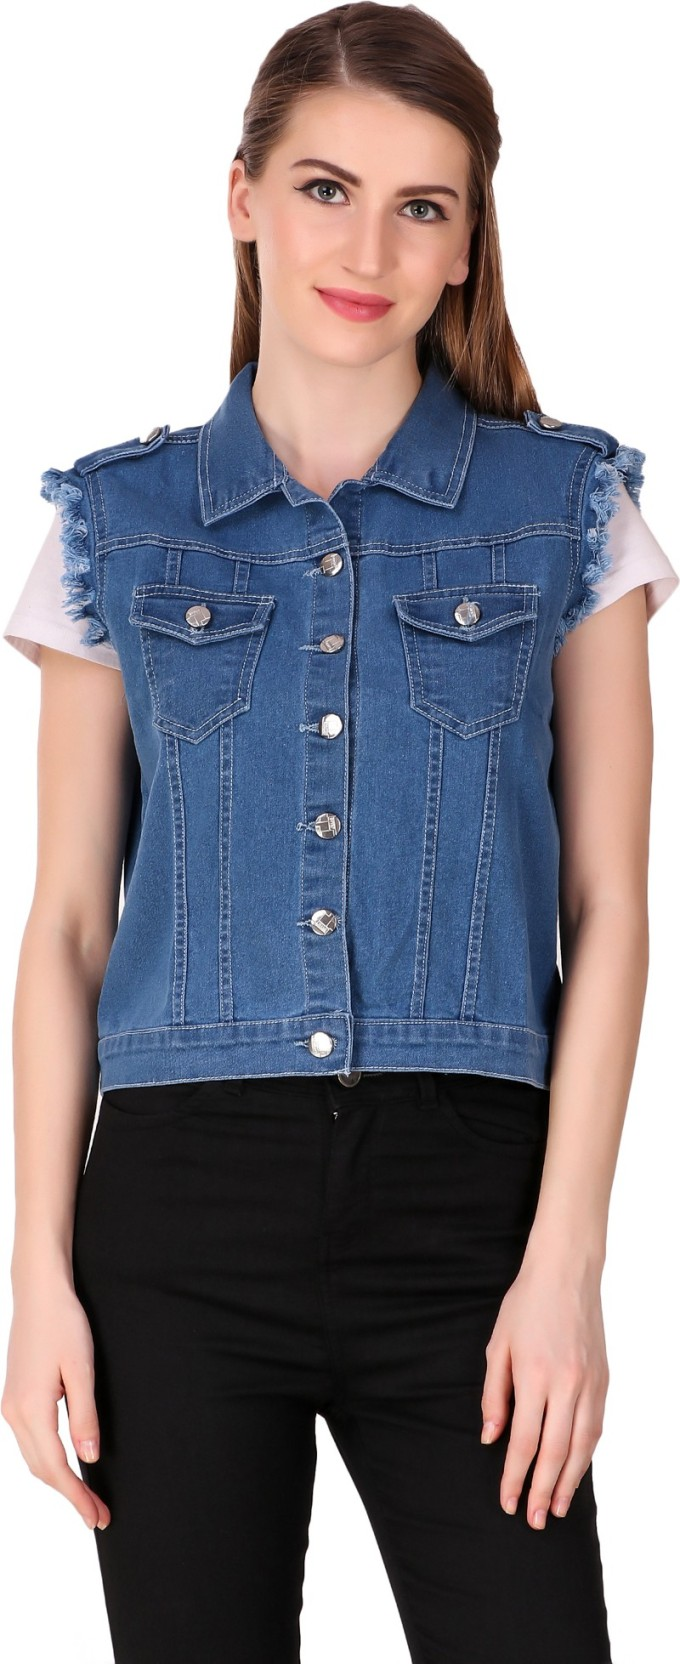 97b4cd1d594 Girls Shopping Sleeveless Solid Women Denim Jacket - Buy Girls ...